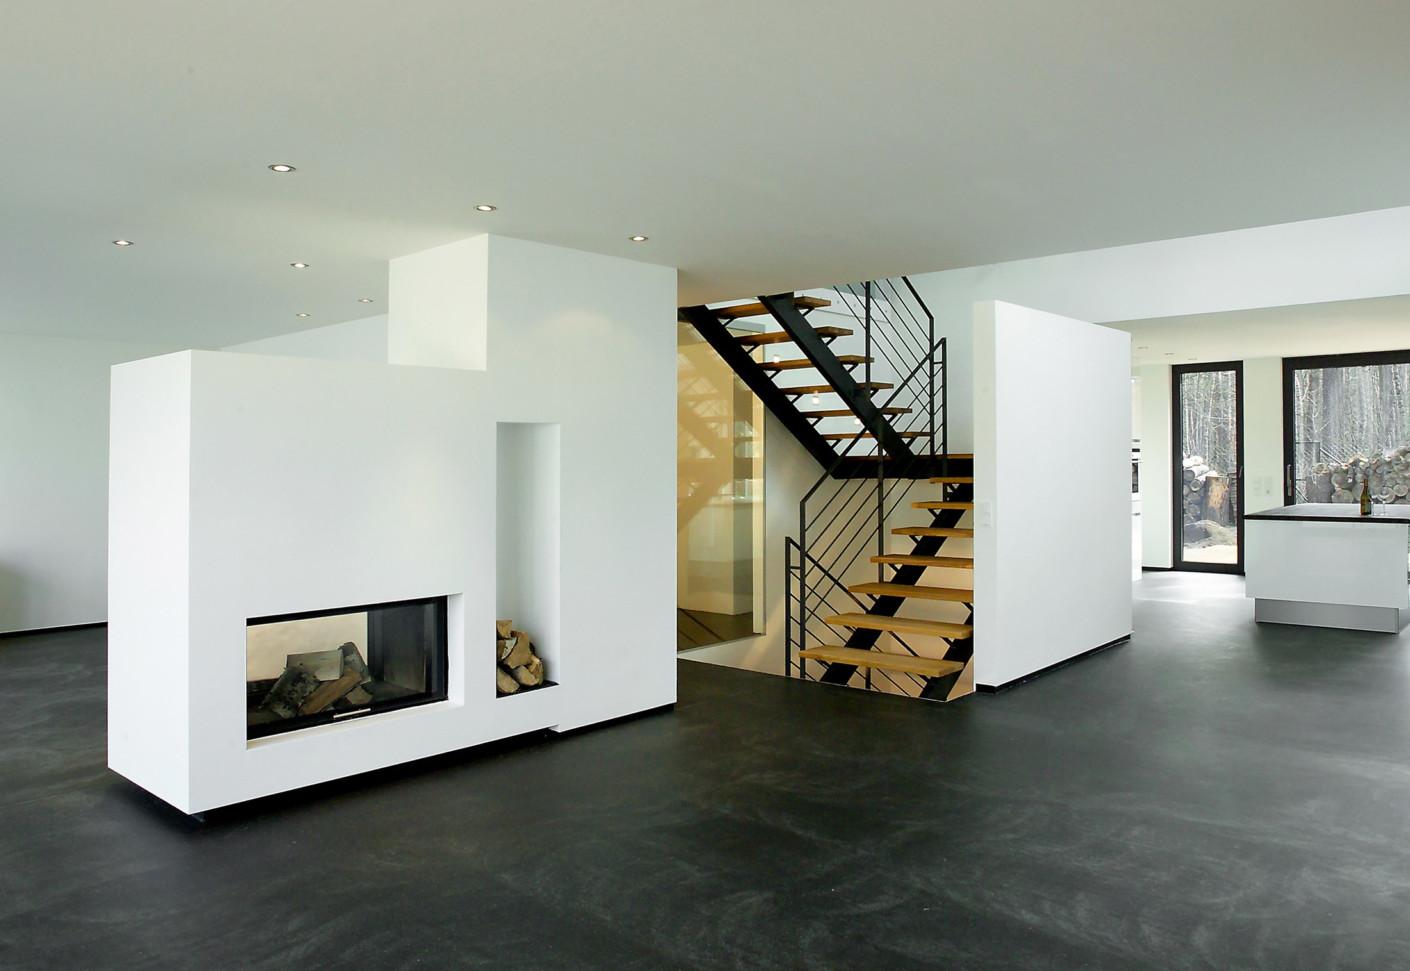 treppe trifft glas 3 0 von spitzbart stylepark. Black Bedroom Furniture Sets. Home Design Ideas